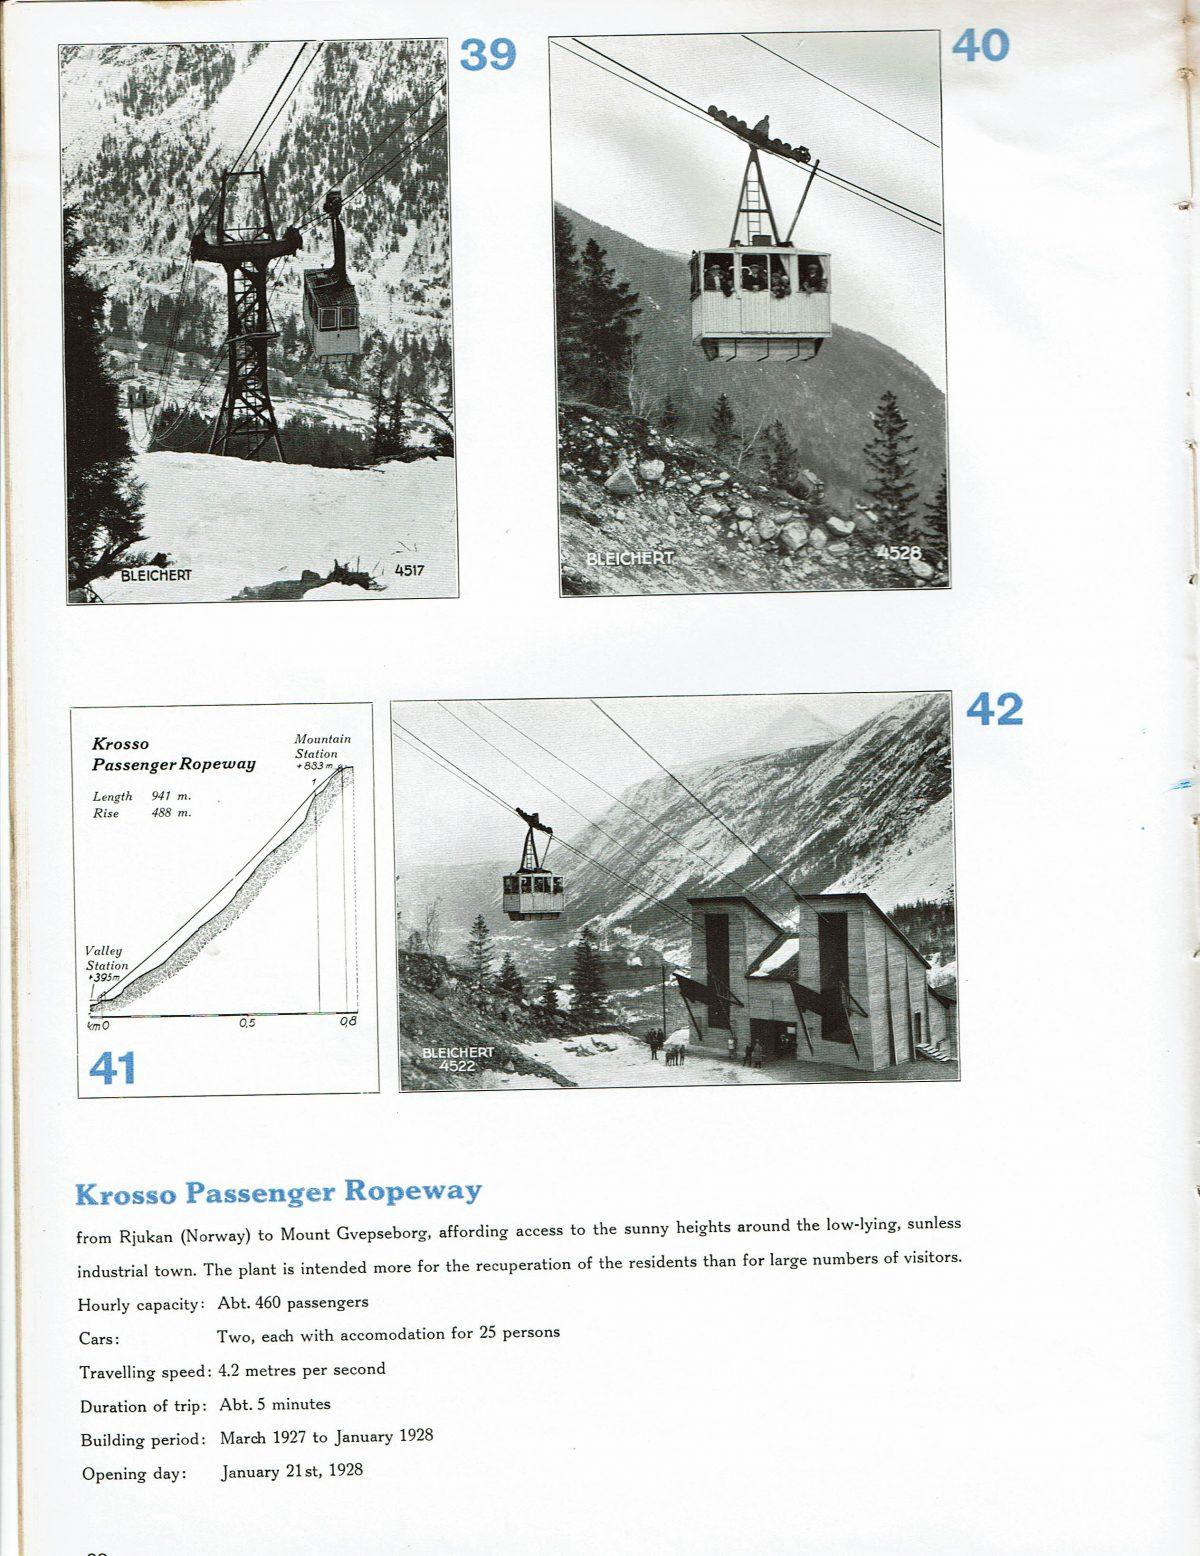 1933 Bleichert Passenger Arial Ropeways 19